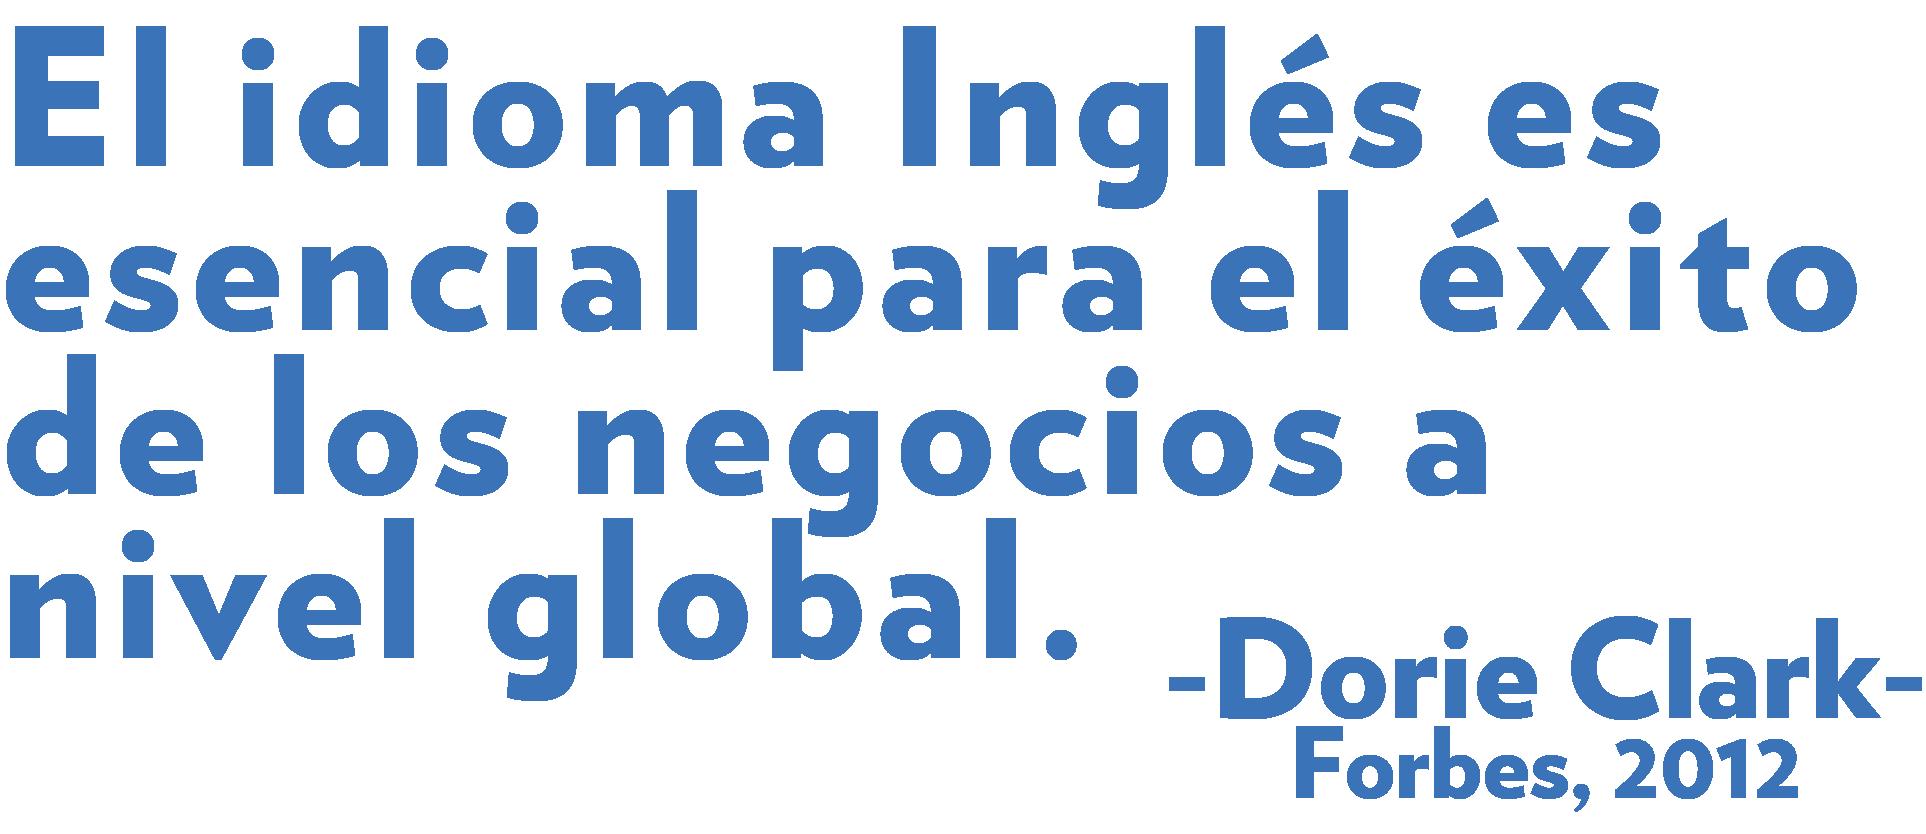 quote_empresas_web.png